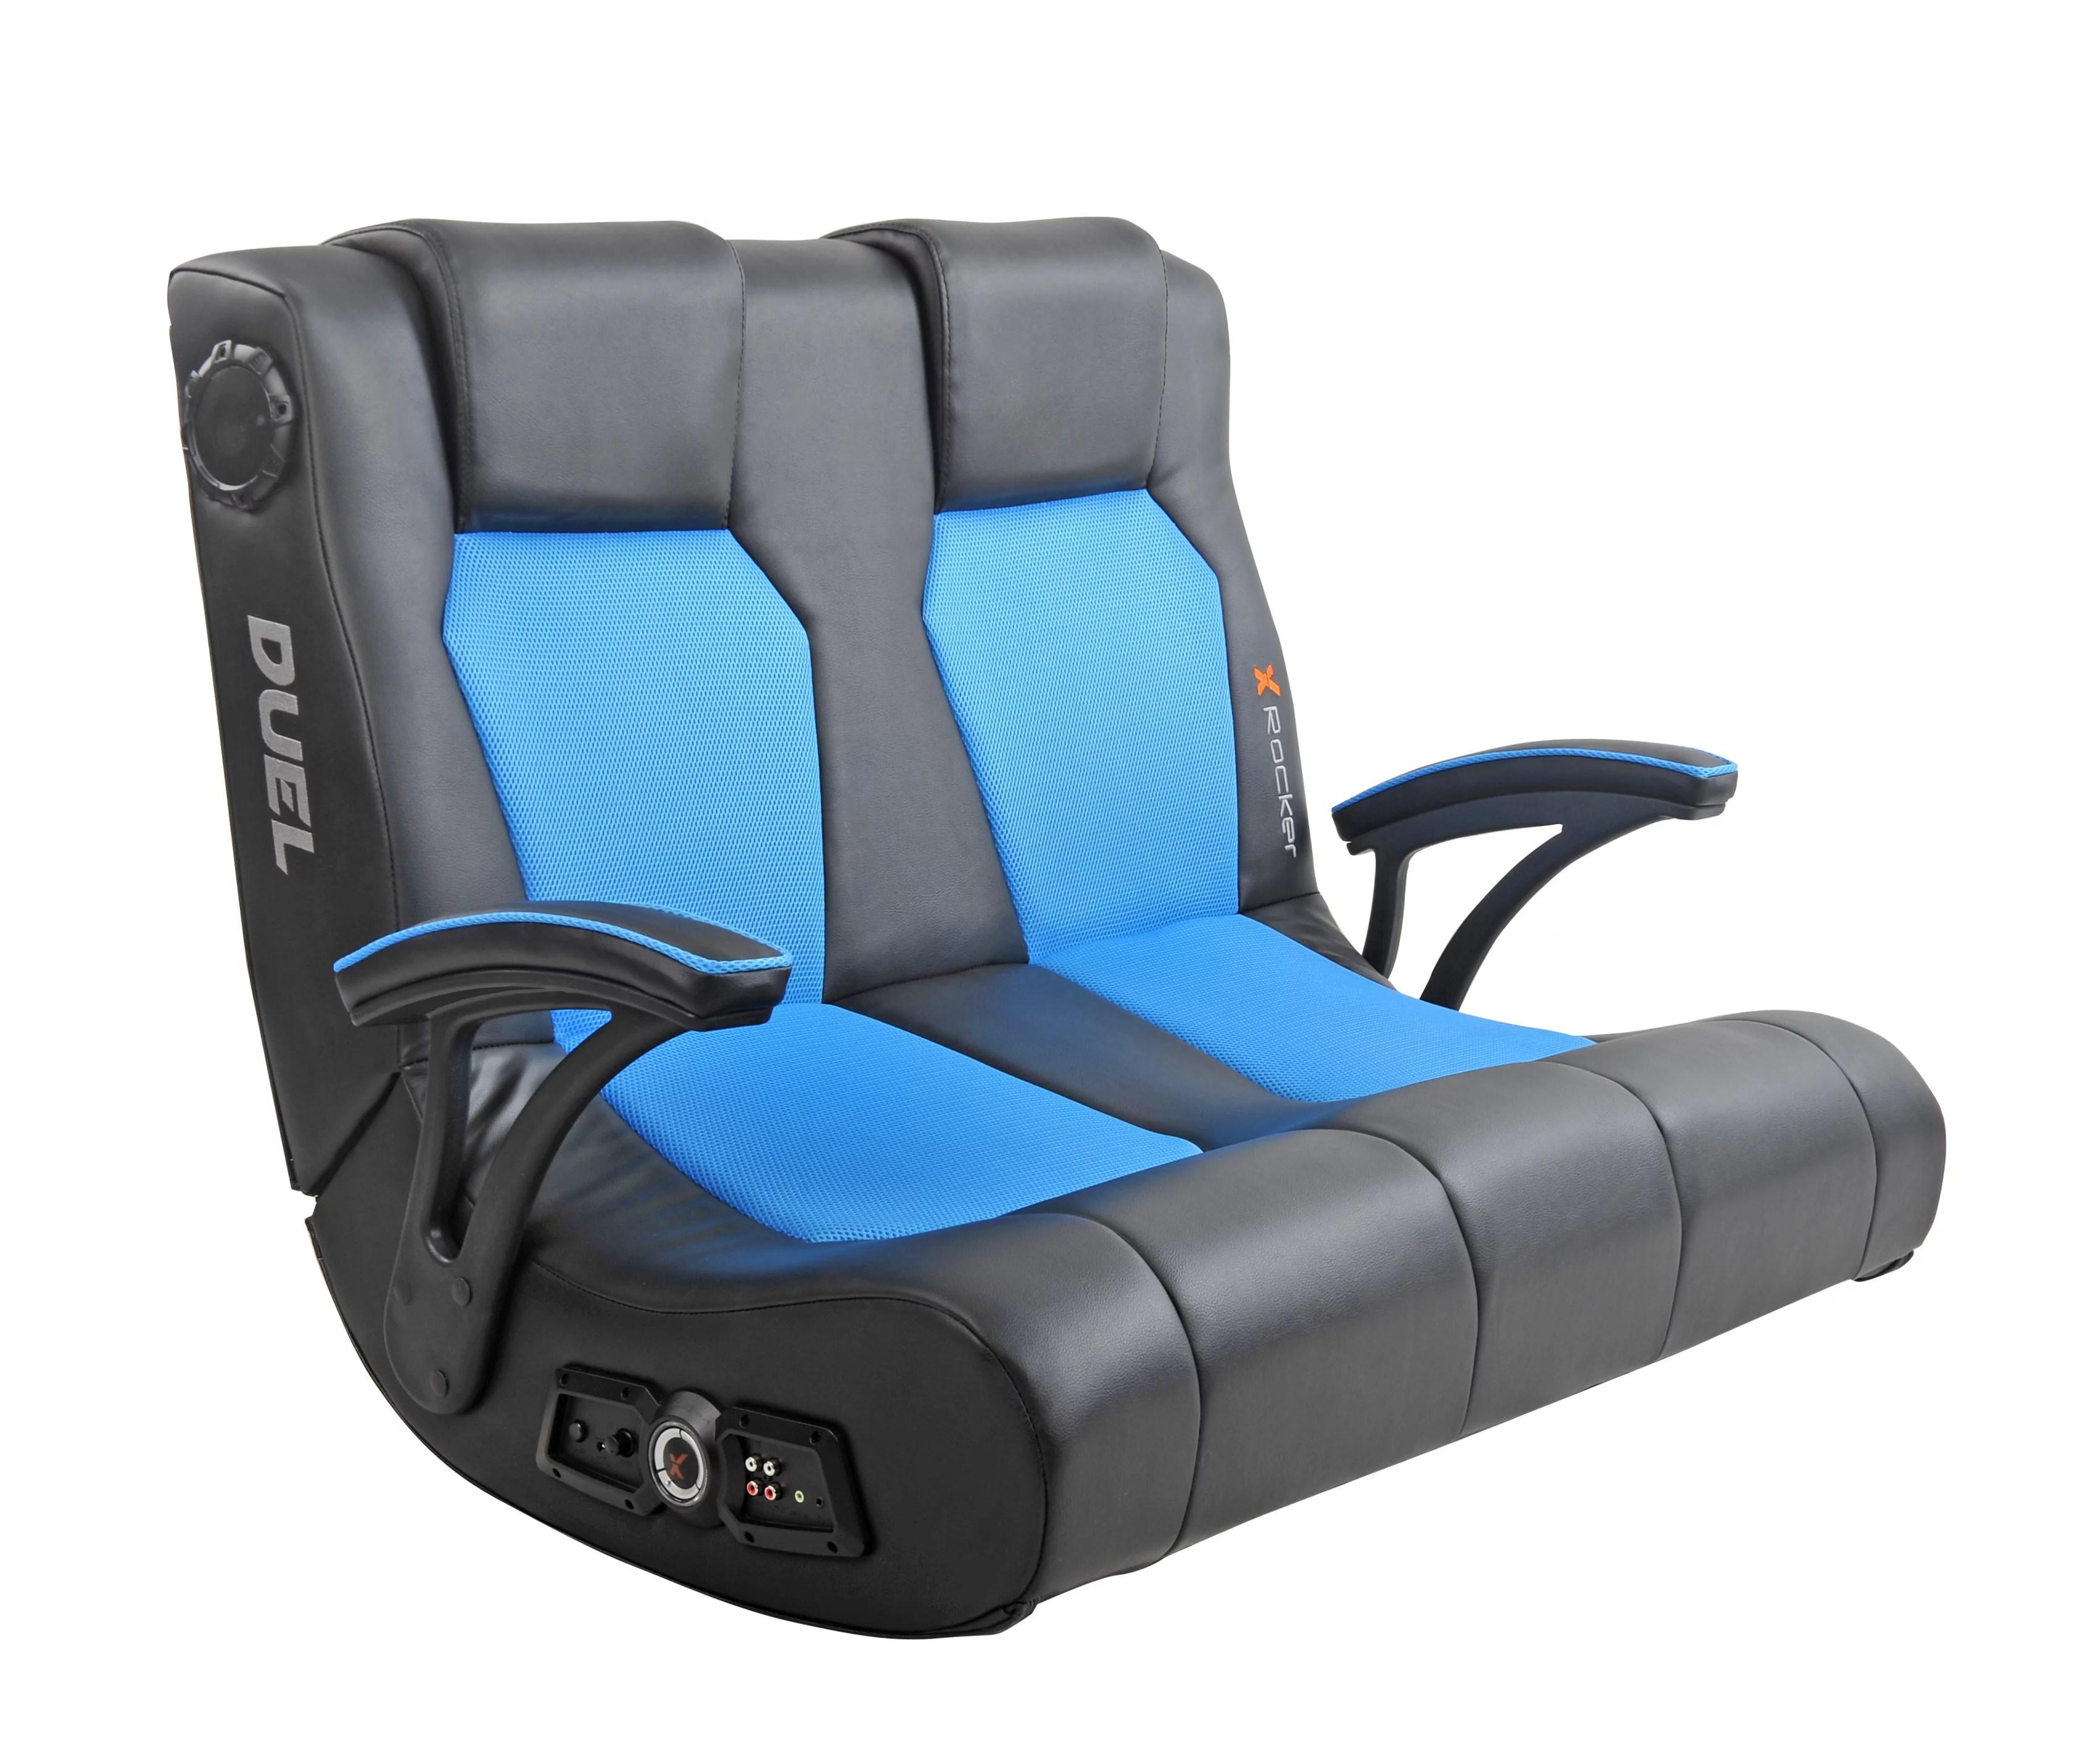 x rocker gaming chair swivel vanity dual commander available in multiple colors walmart com